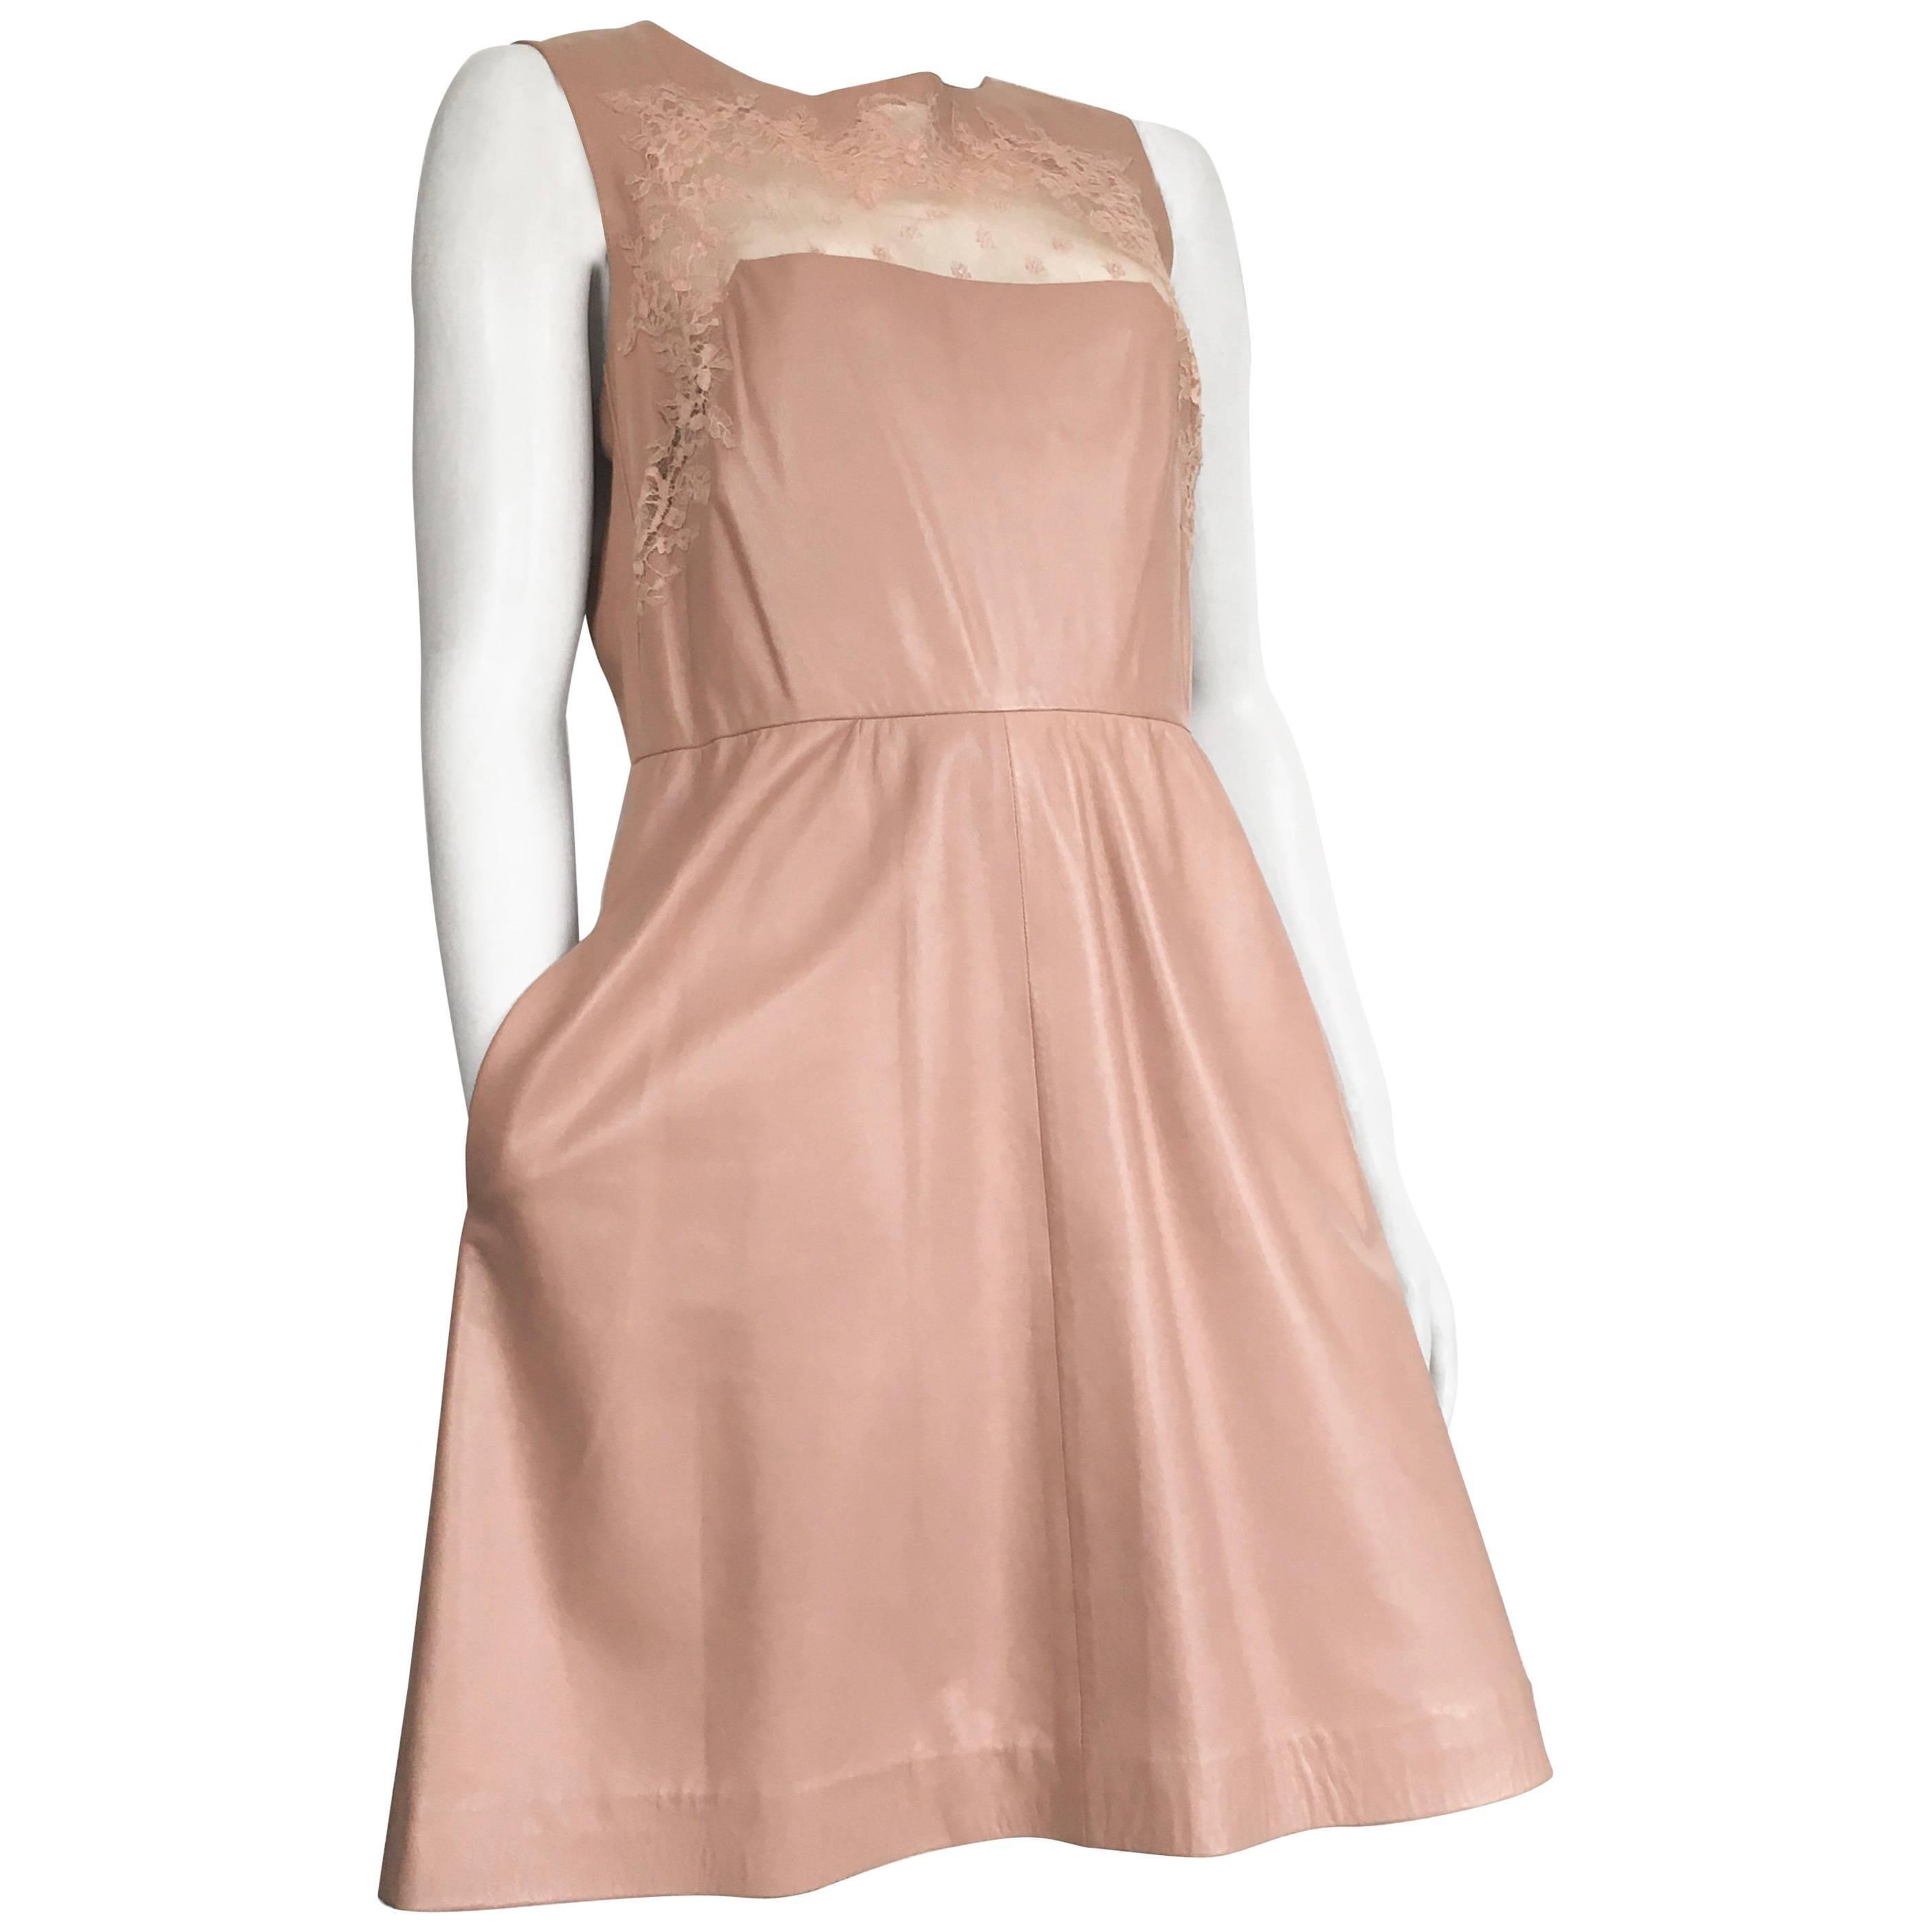 Cocktail Dress Size 8